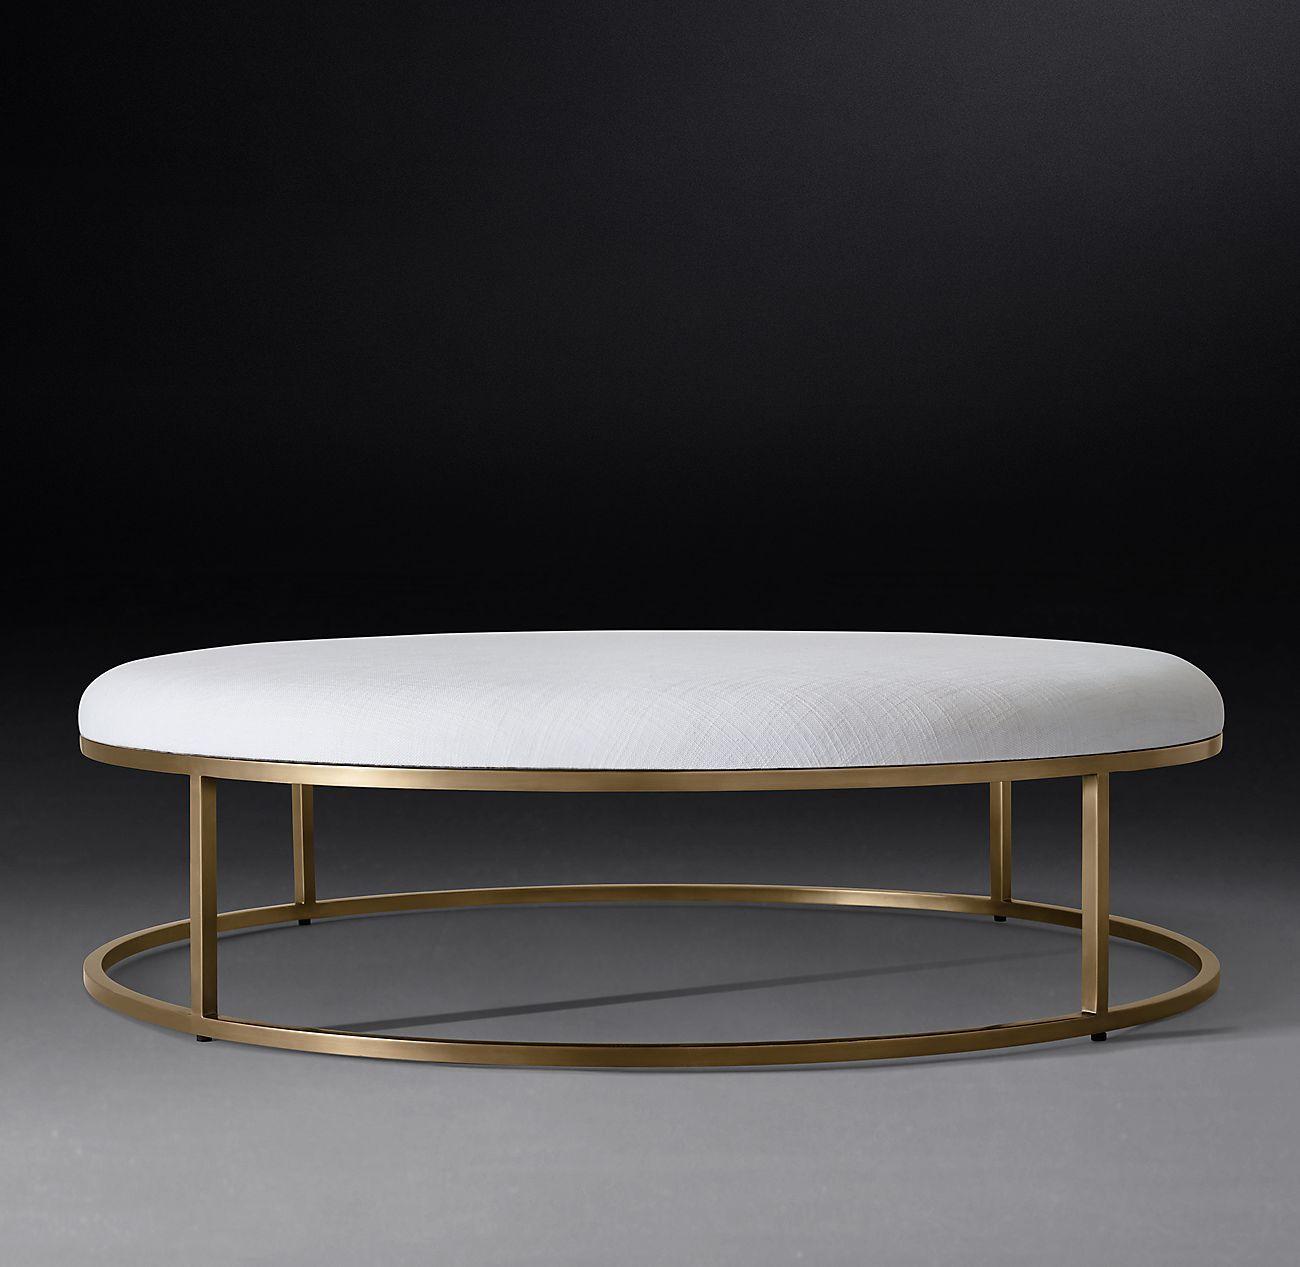 Nicholas Round Fabric Coffee Ottoman Coffee Table Furniture Design Modern Round Ottoman [ 1267 x 1300 Pixel ]